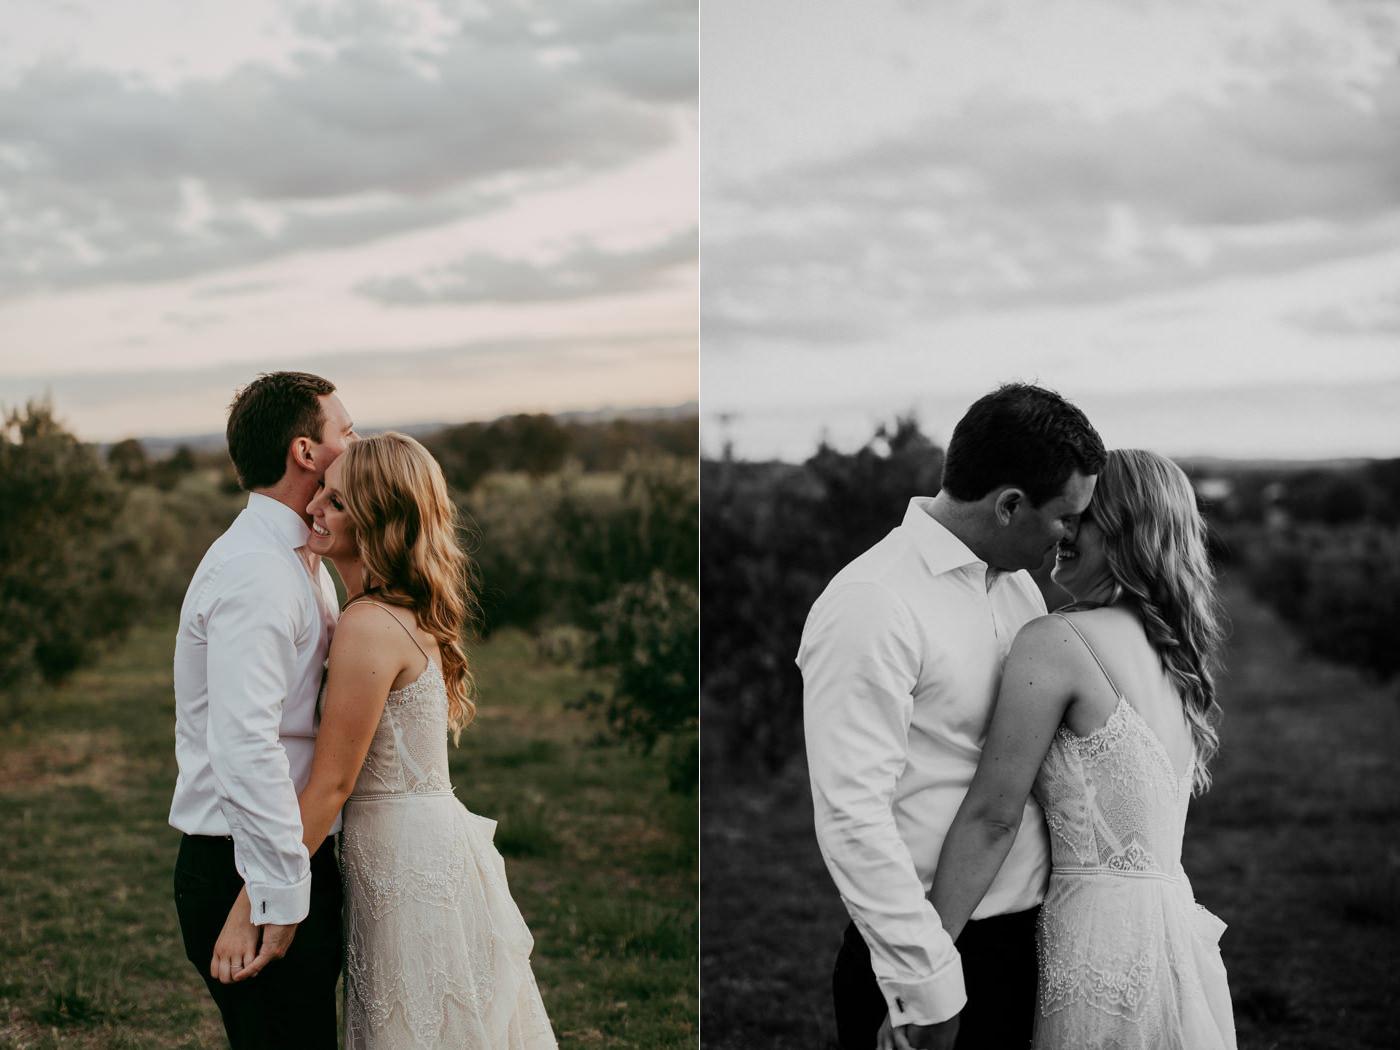 Anthony & Eliet - Wagga Wagga Wedding - Country NSW - Samantha Heather Photography-164.jpg